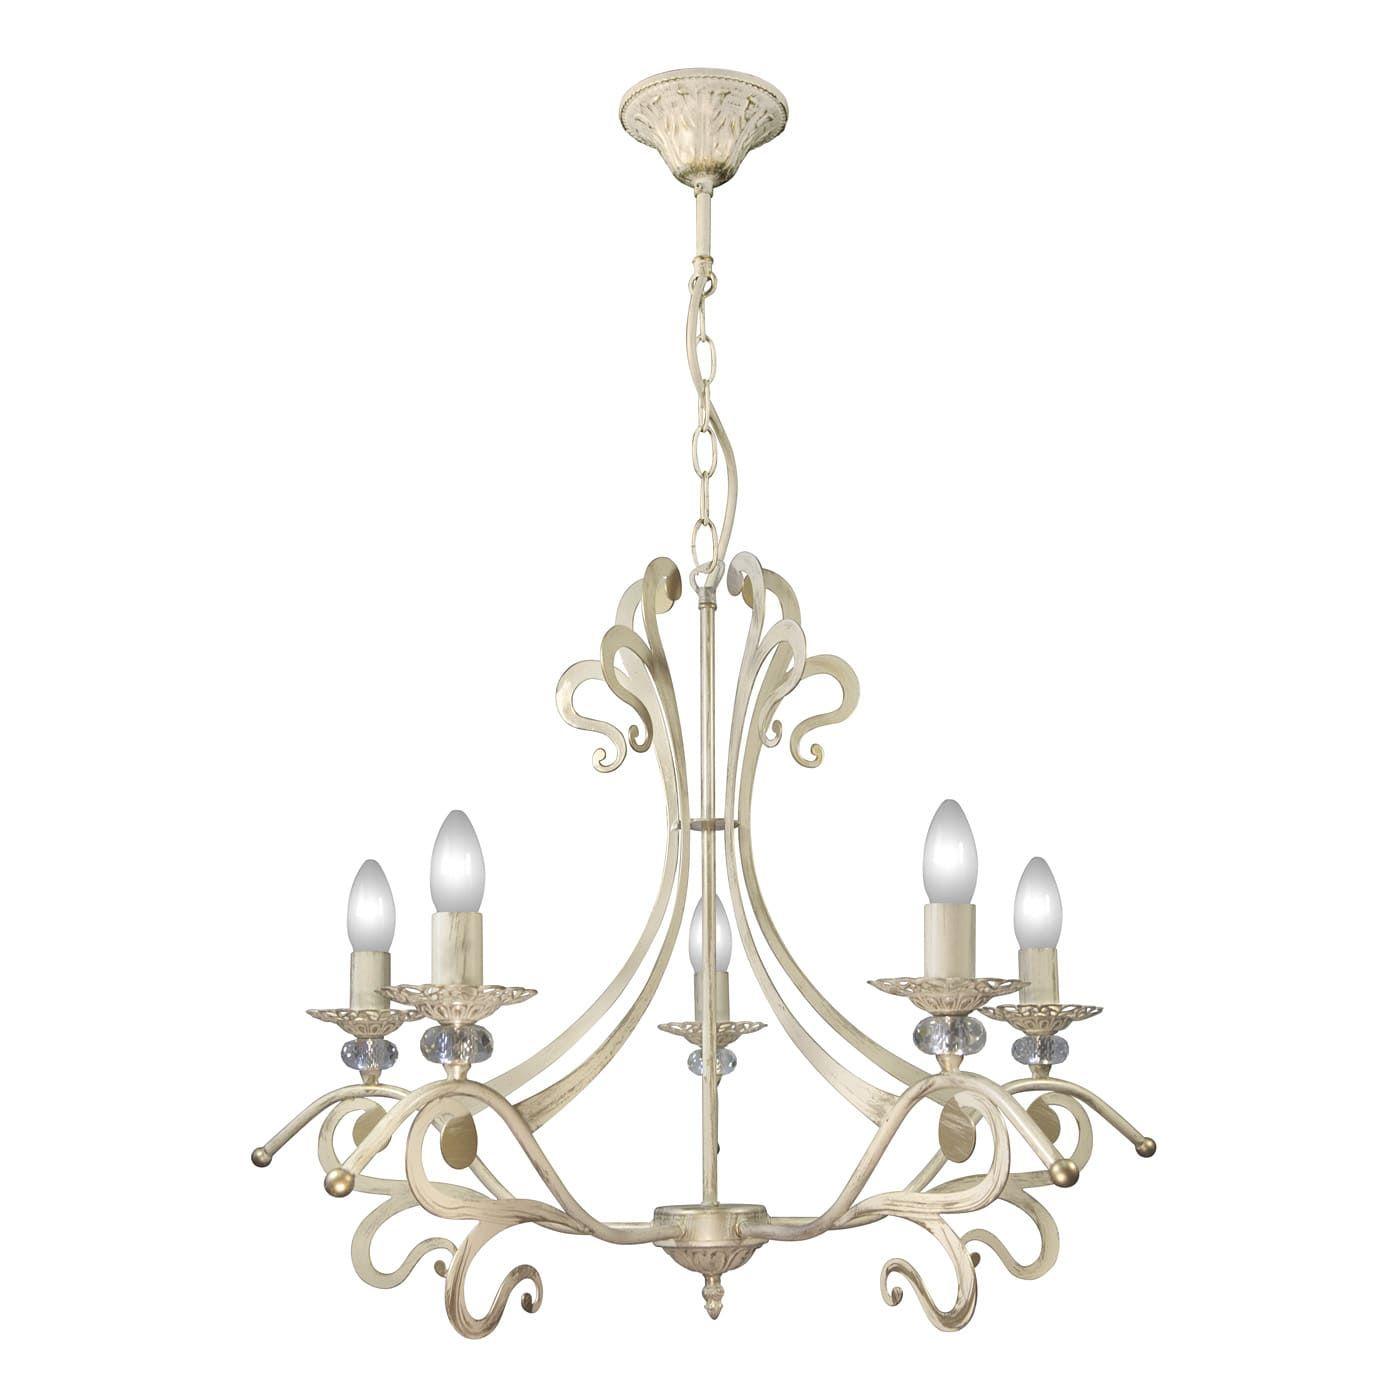 PETRASVET / Pendant chandelier S3124-8, 8xE14 max. 60W